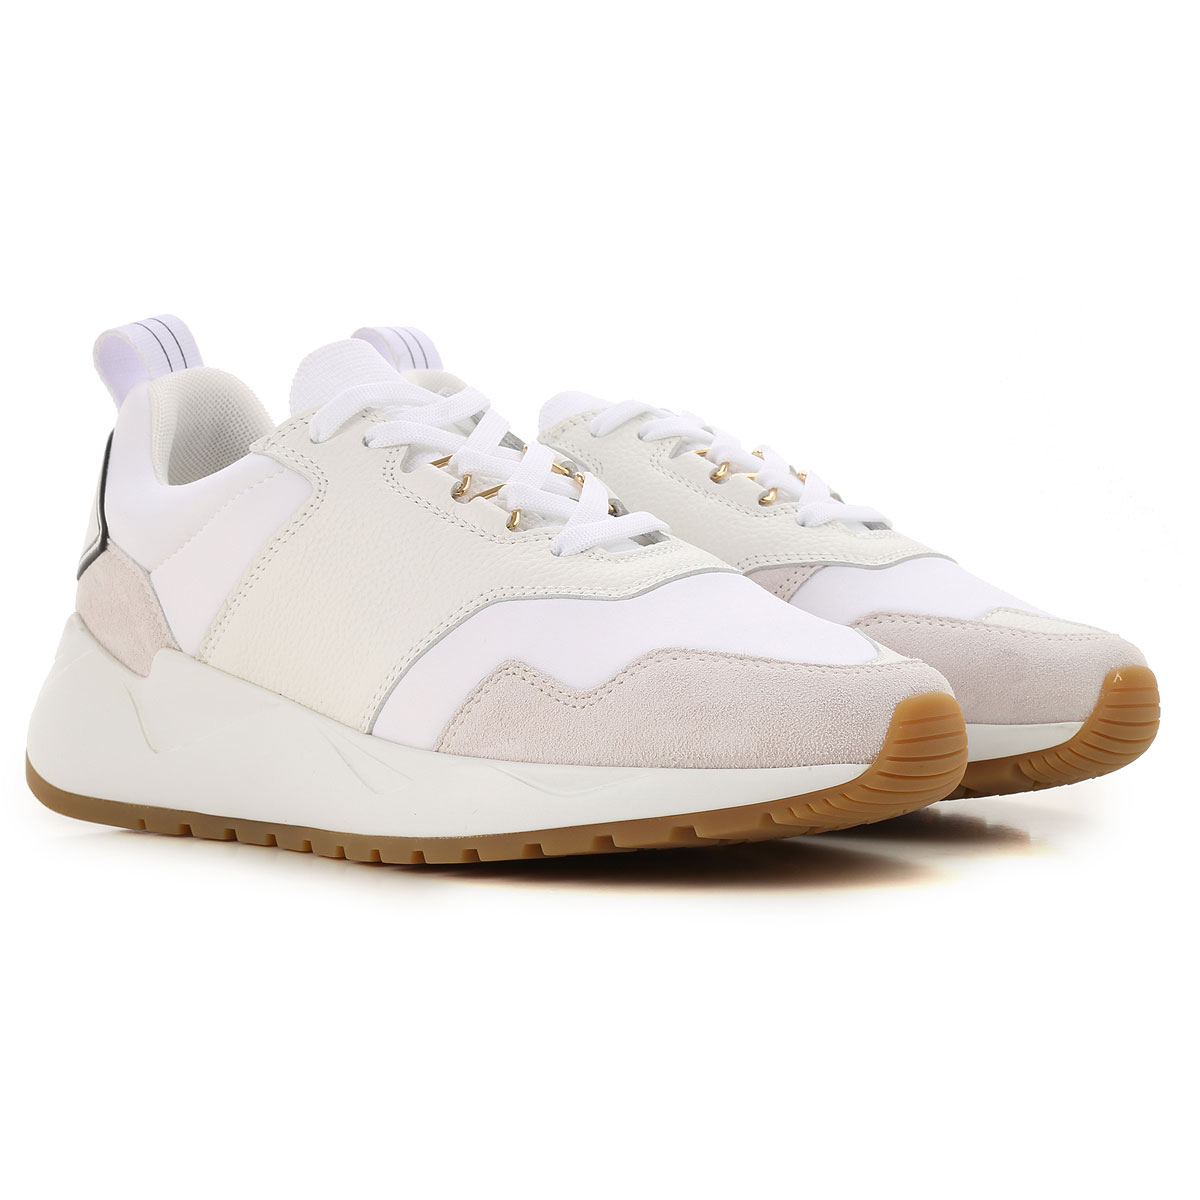 Image of Buscemi Sneakers for Women, White, Neoprene, 2017, 10 6 7 8